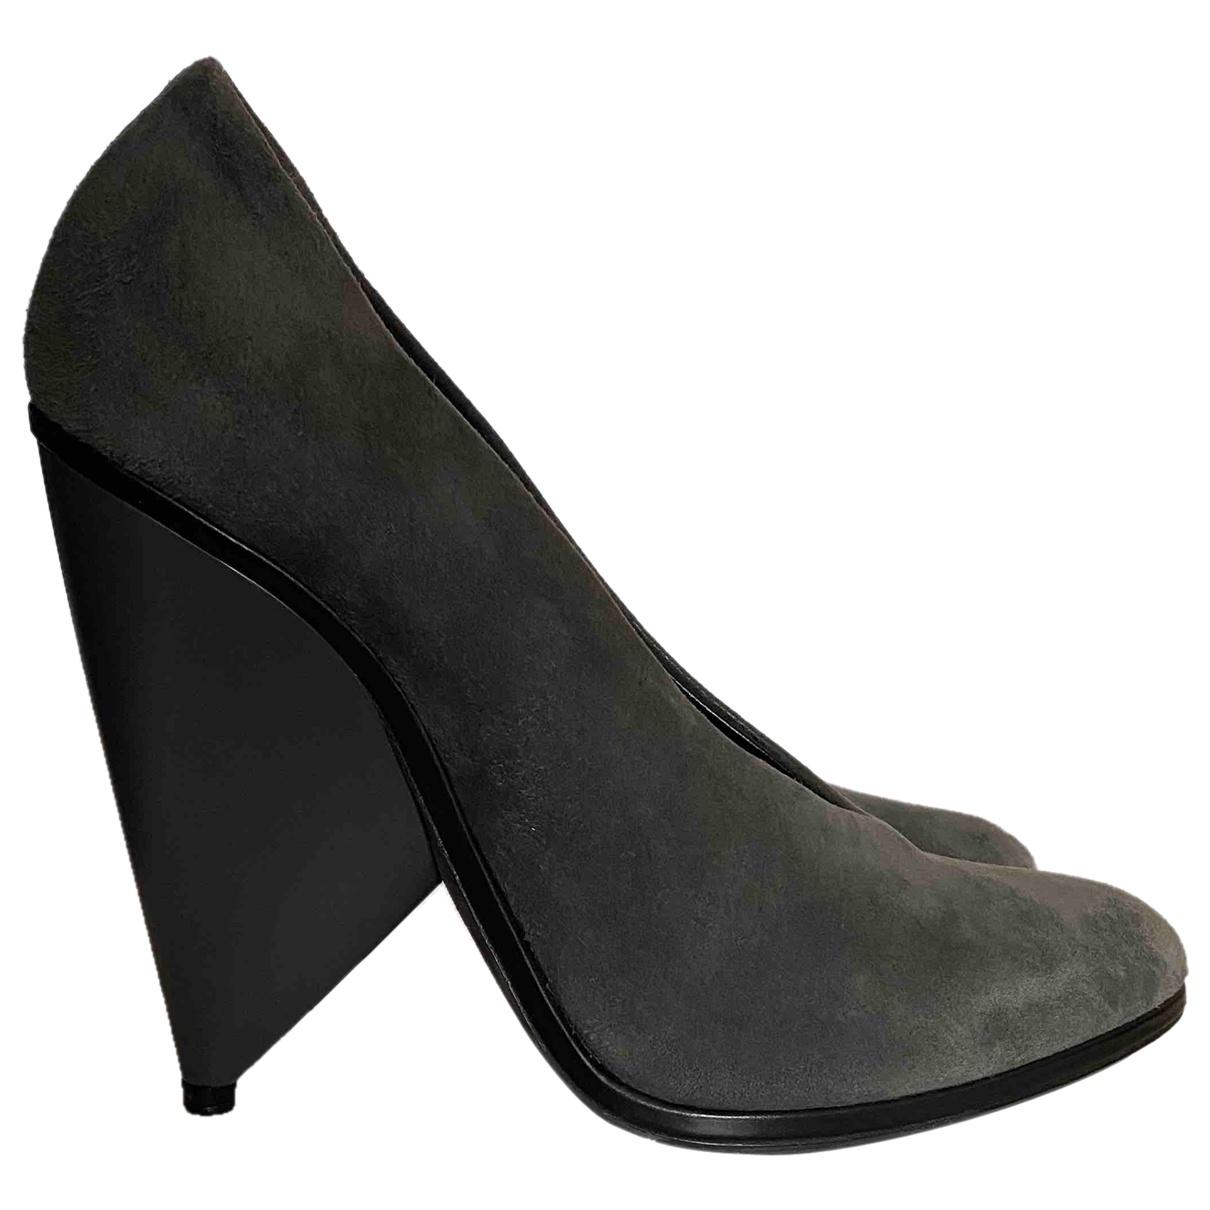 Balenciaga \N Anthracite Suede Heels for Women 40 EU